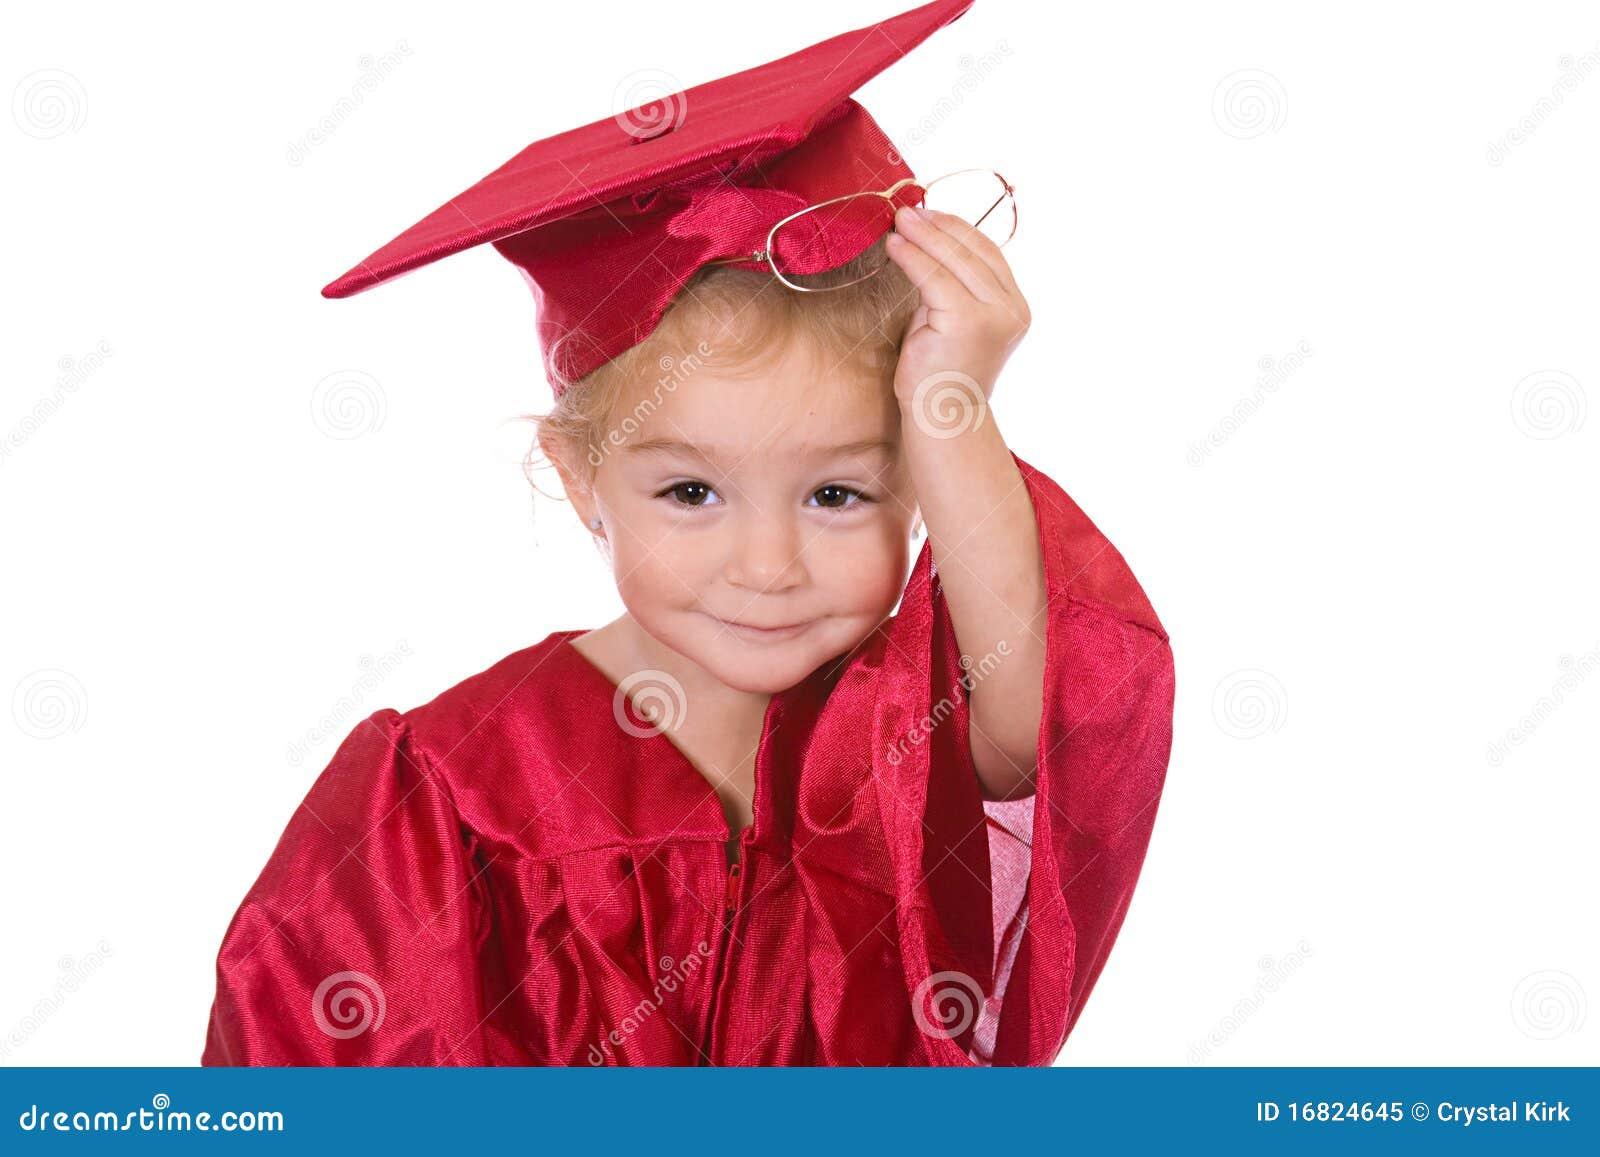 Young scholar stock image. Image of smart, gown, preschool - 16824645